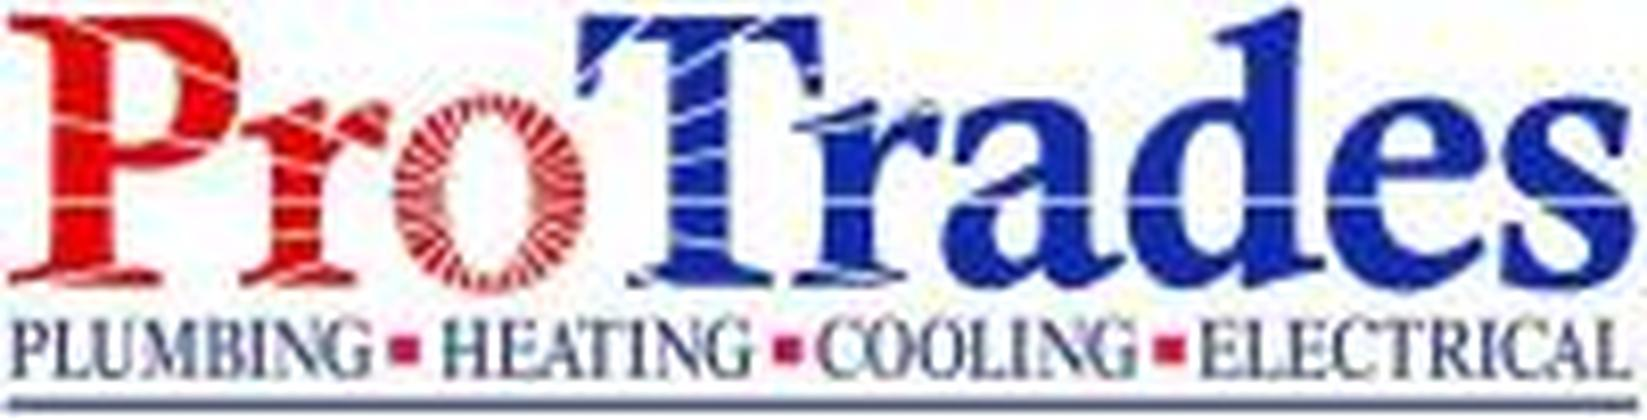 Pro Trades Mechanical Inc.